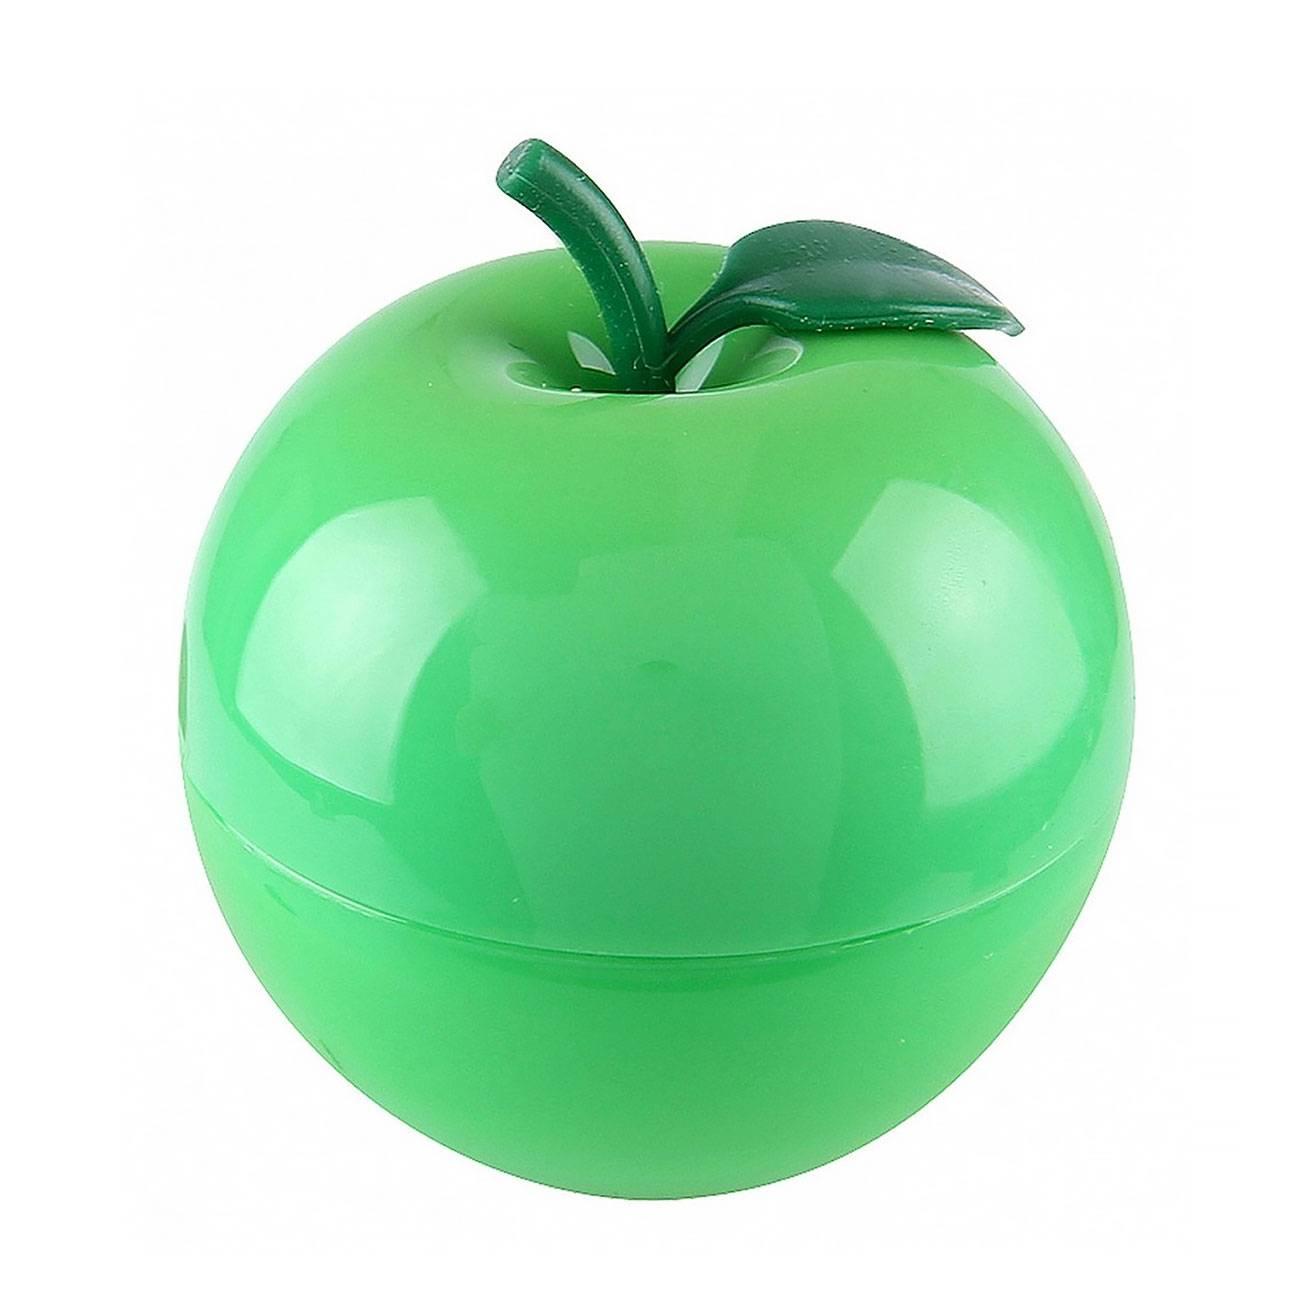 Mini Green Apple Lip Balm 7gr Tony Moly imagine 2021 bestvalue.eu